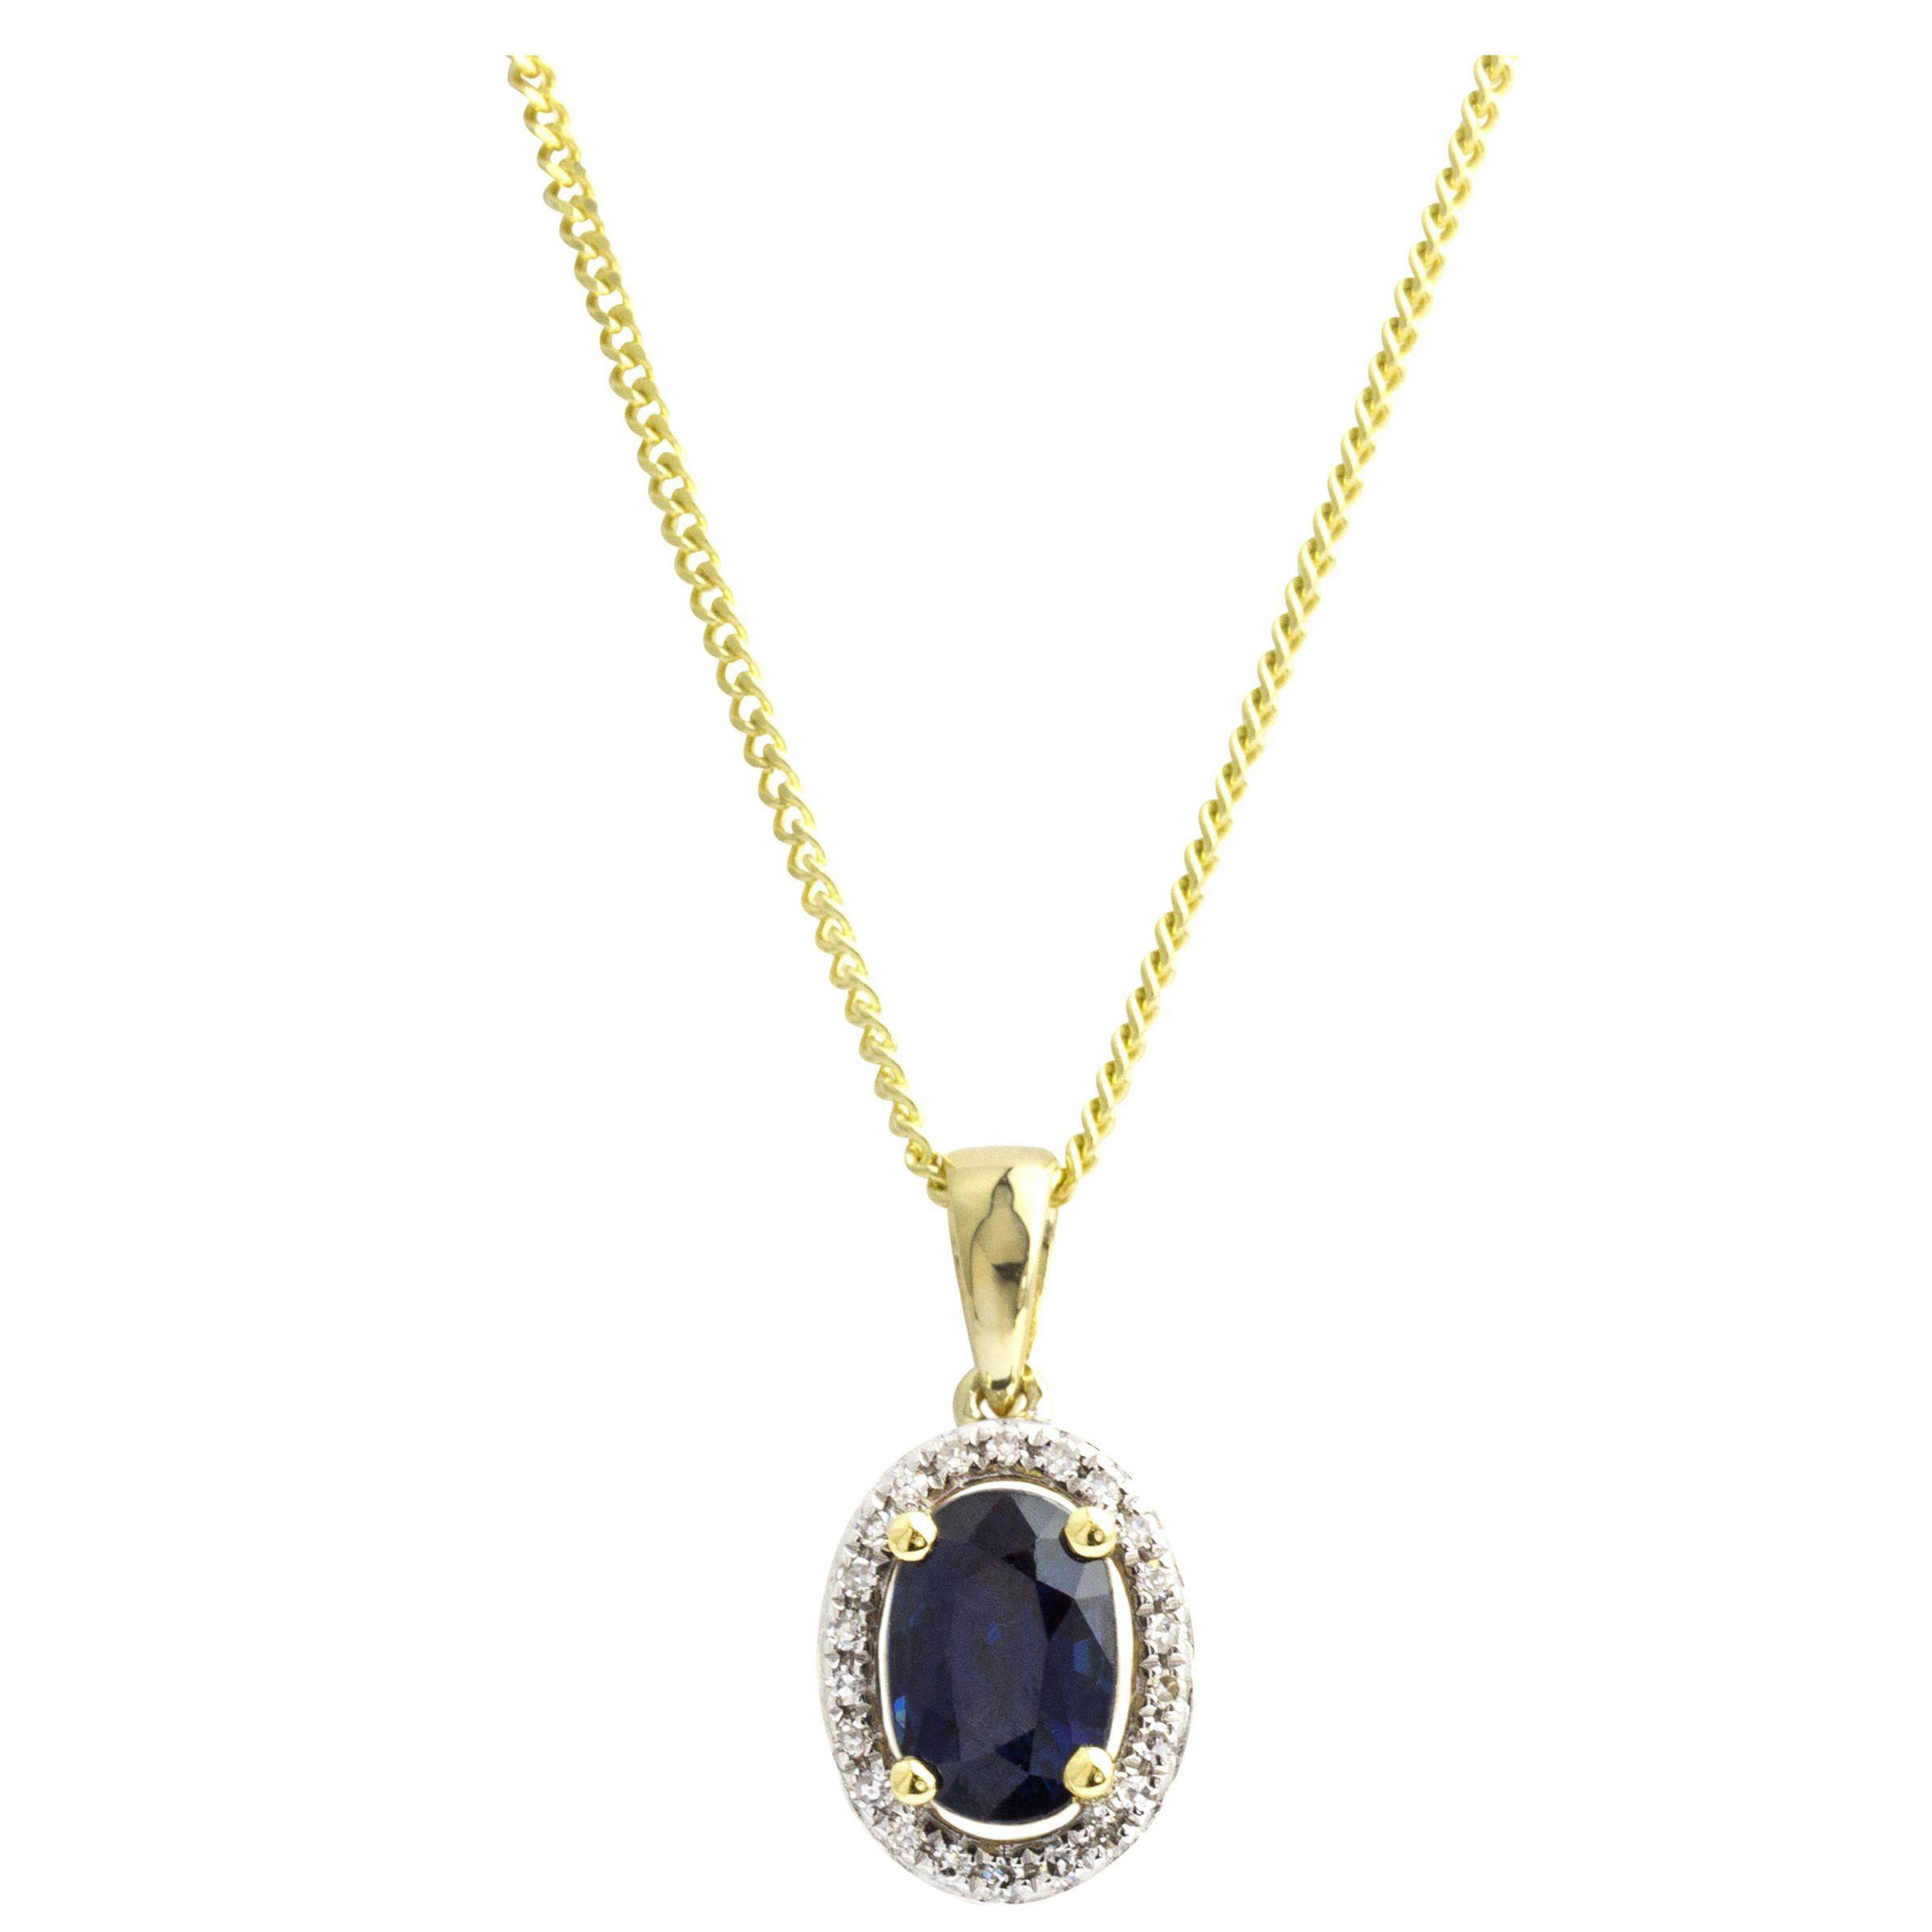 A B Davis A B Davis 9ct Gold Diamond Surround Oval Pendant Necklace, Sapphire